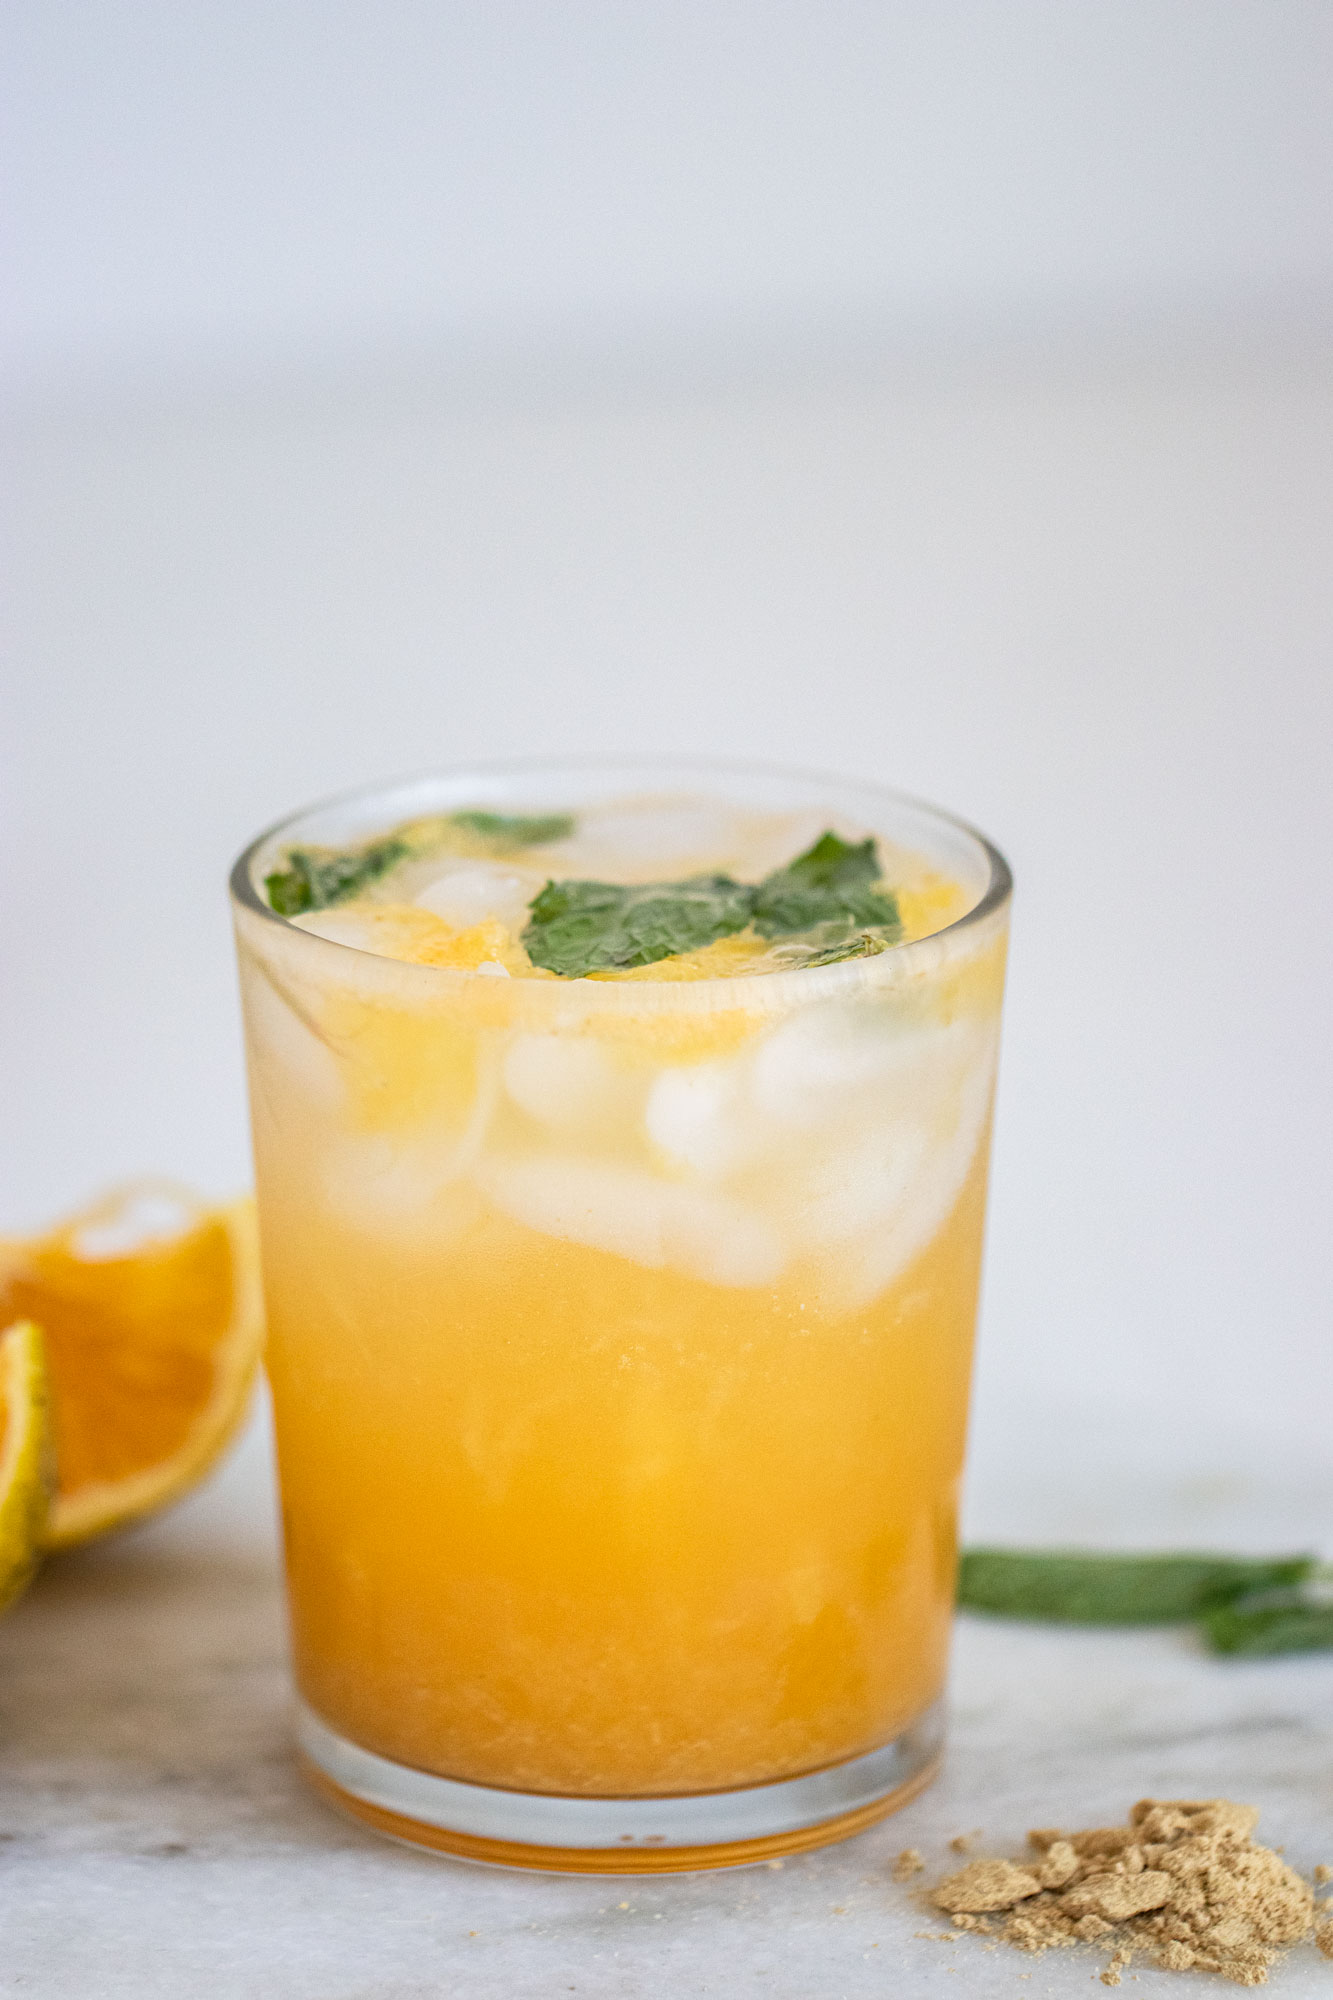 Bebida refrescante de naranja